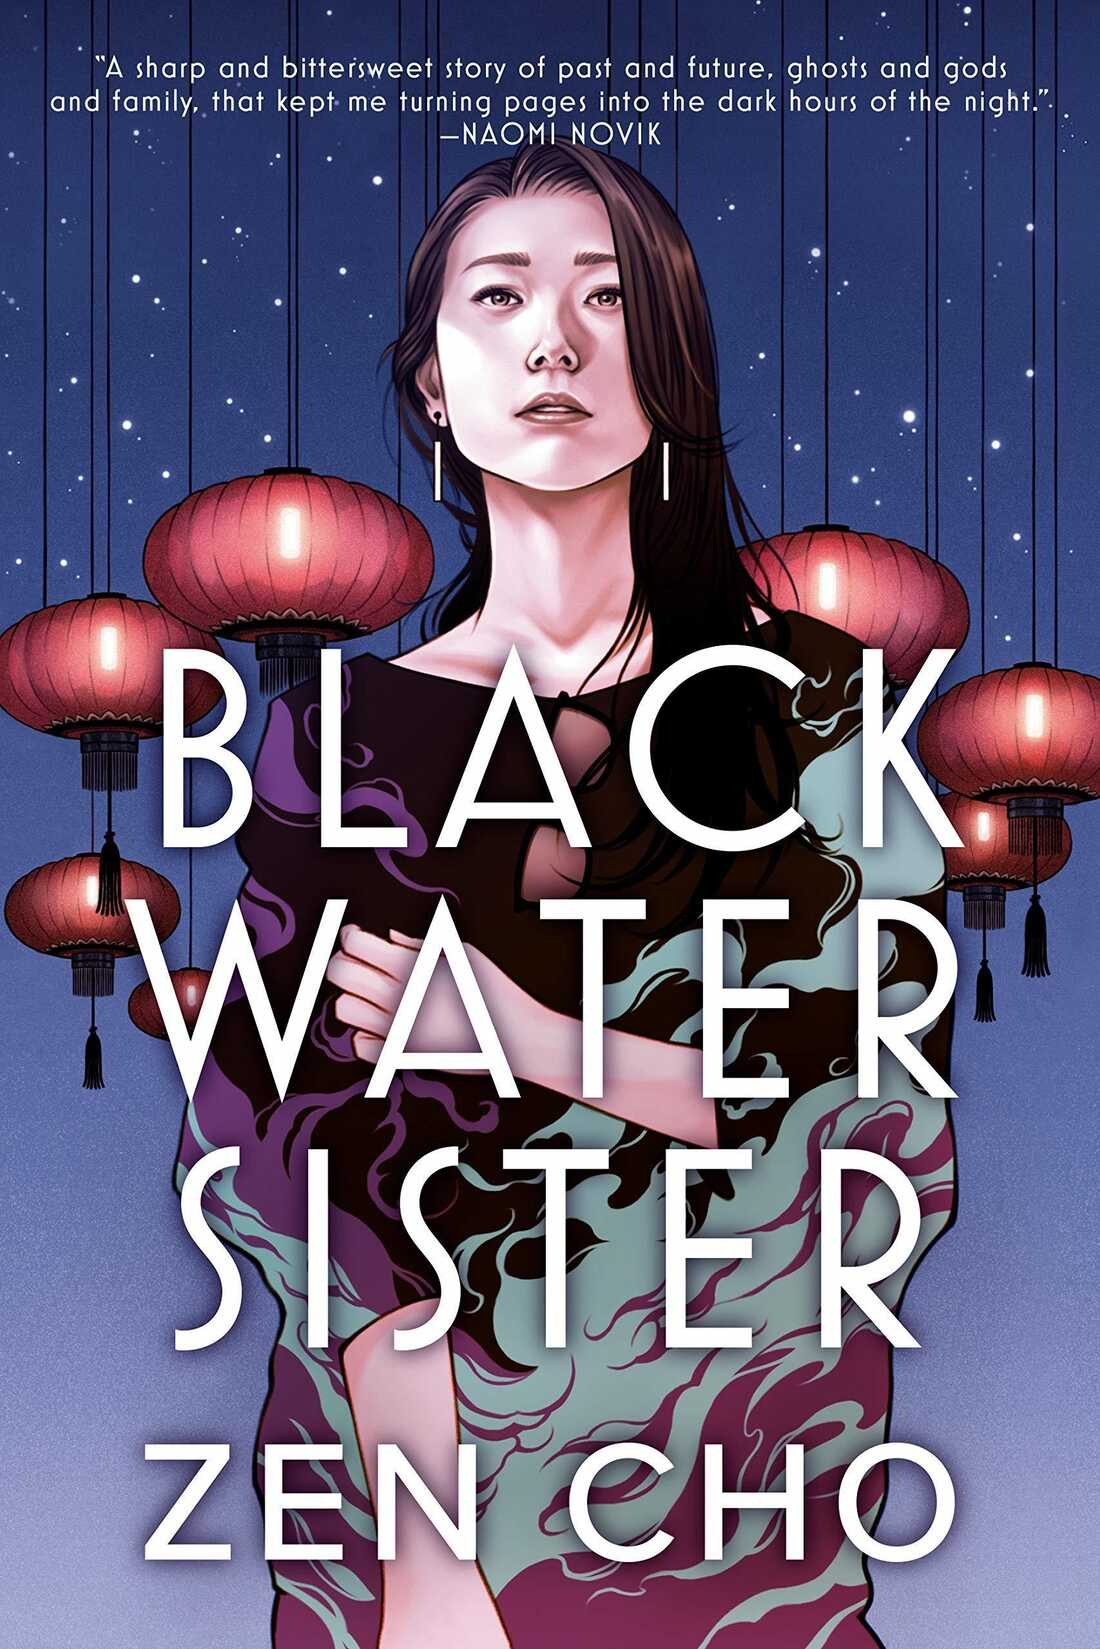 Black Water Sister, by Zen Cho